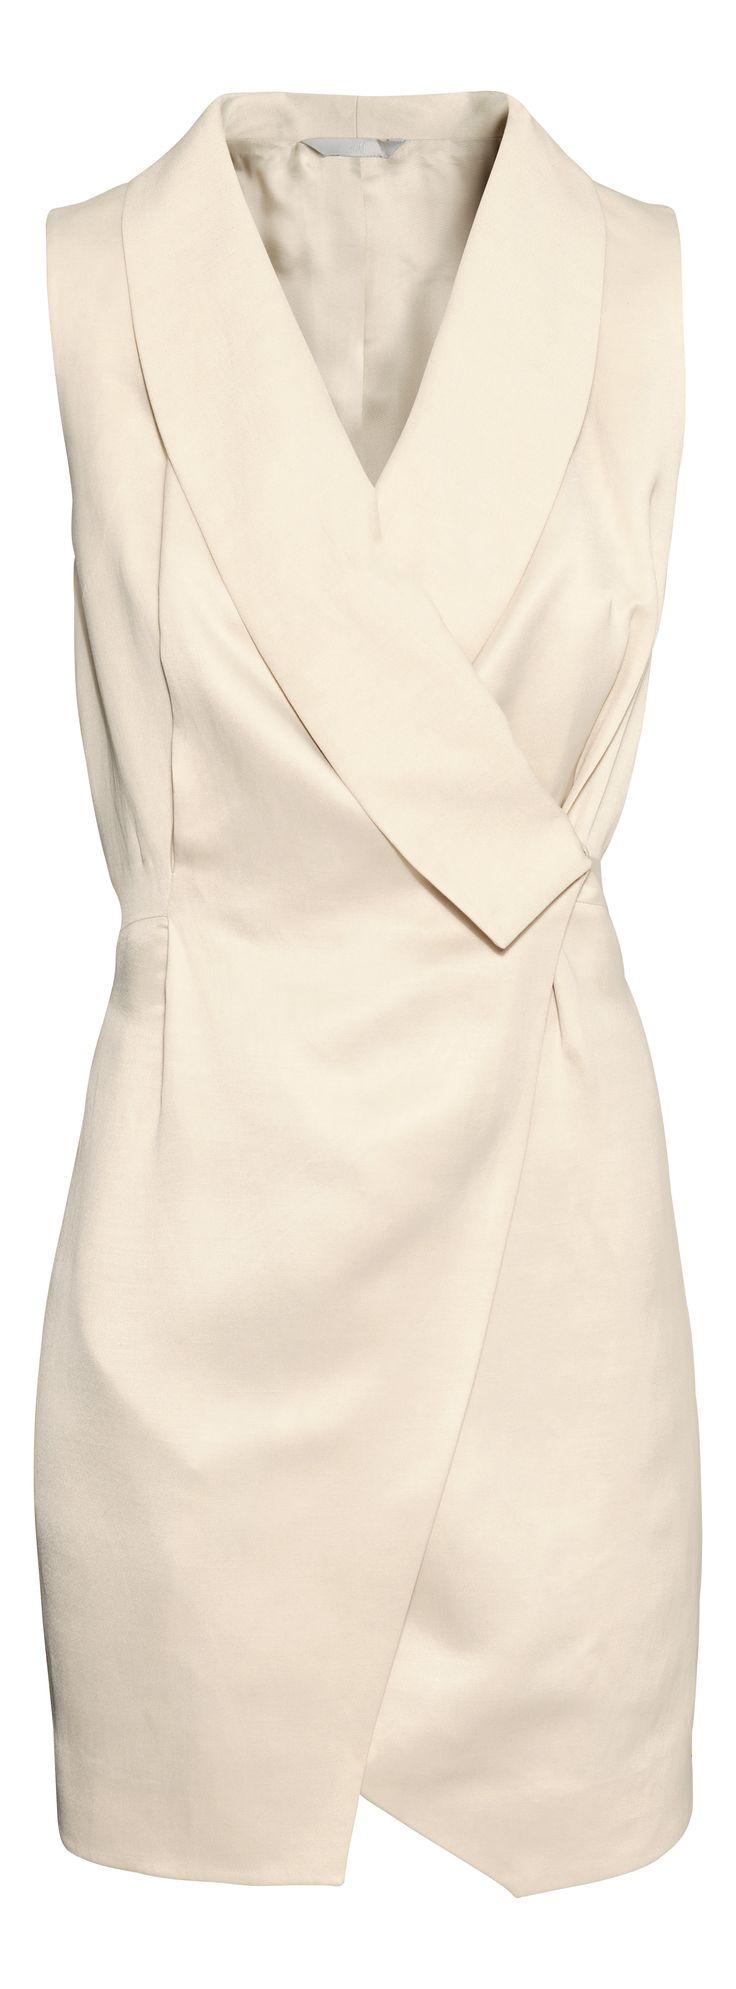 50 petites robes blanches | Femina